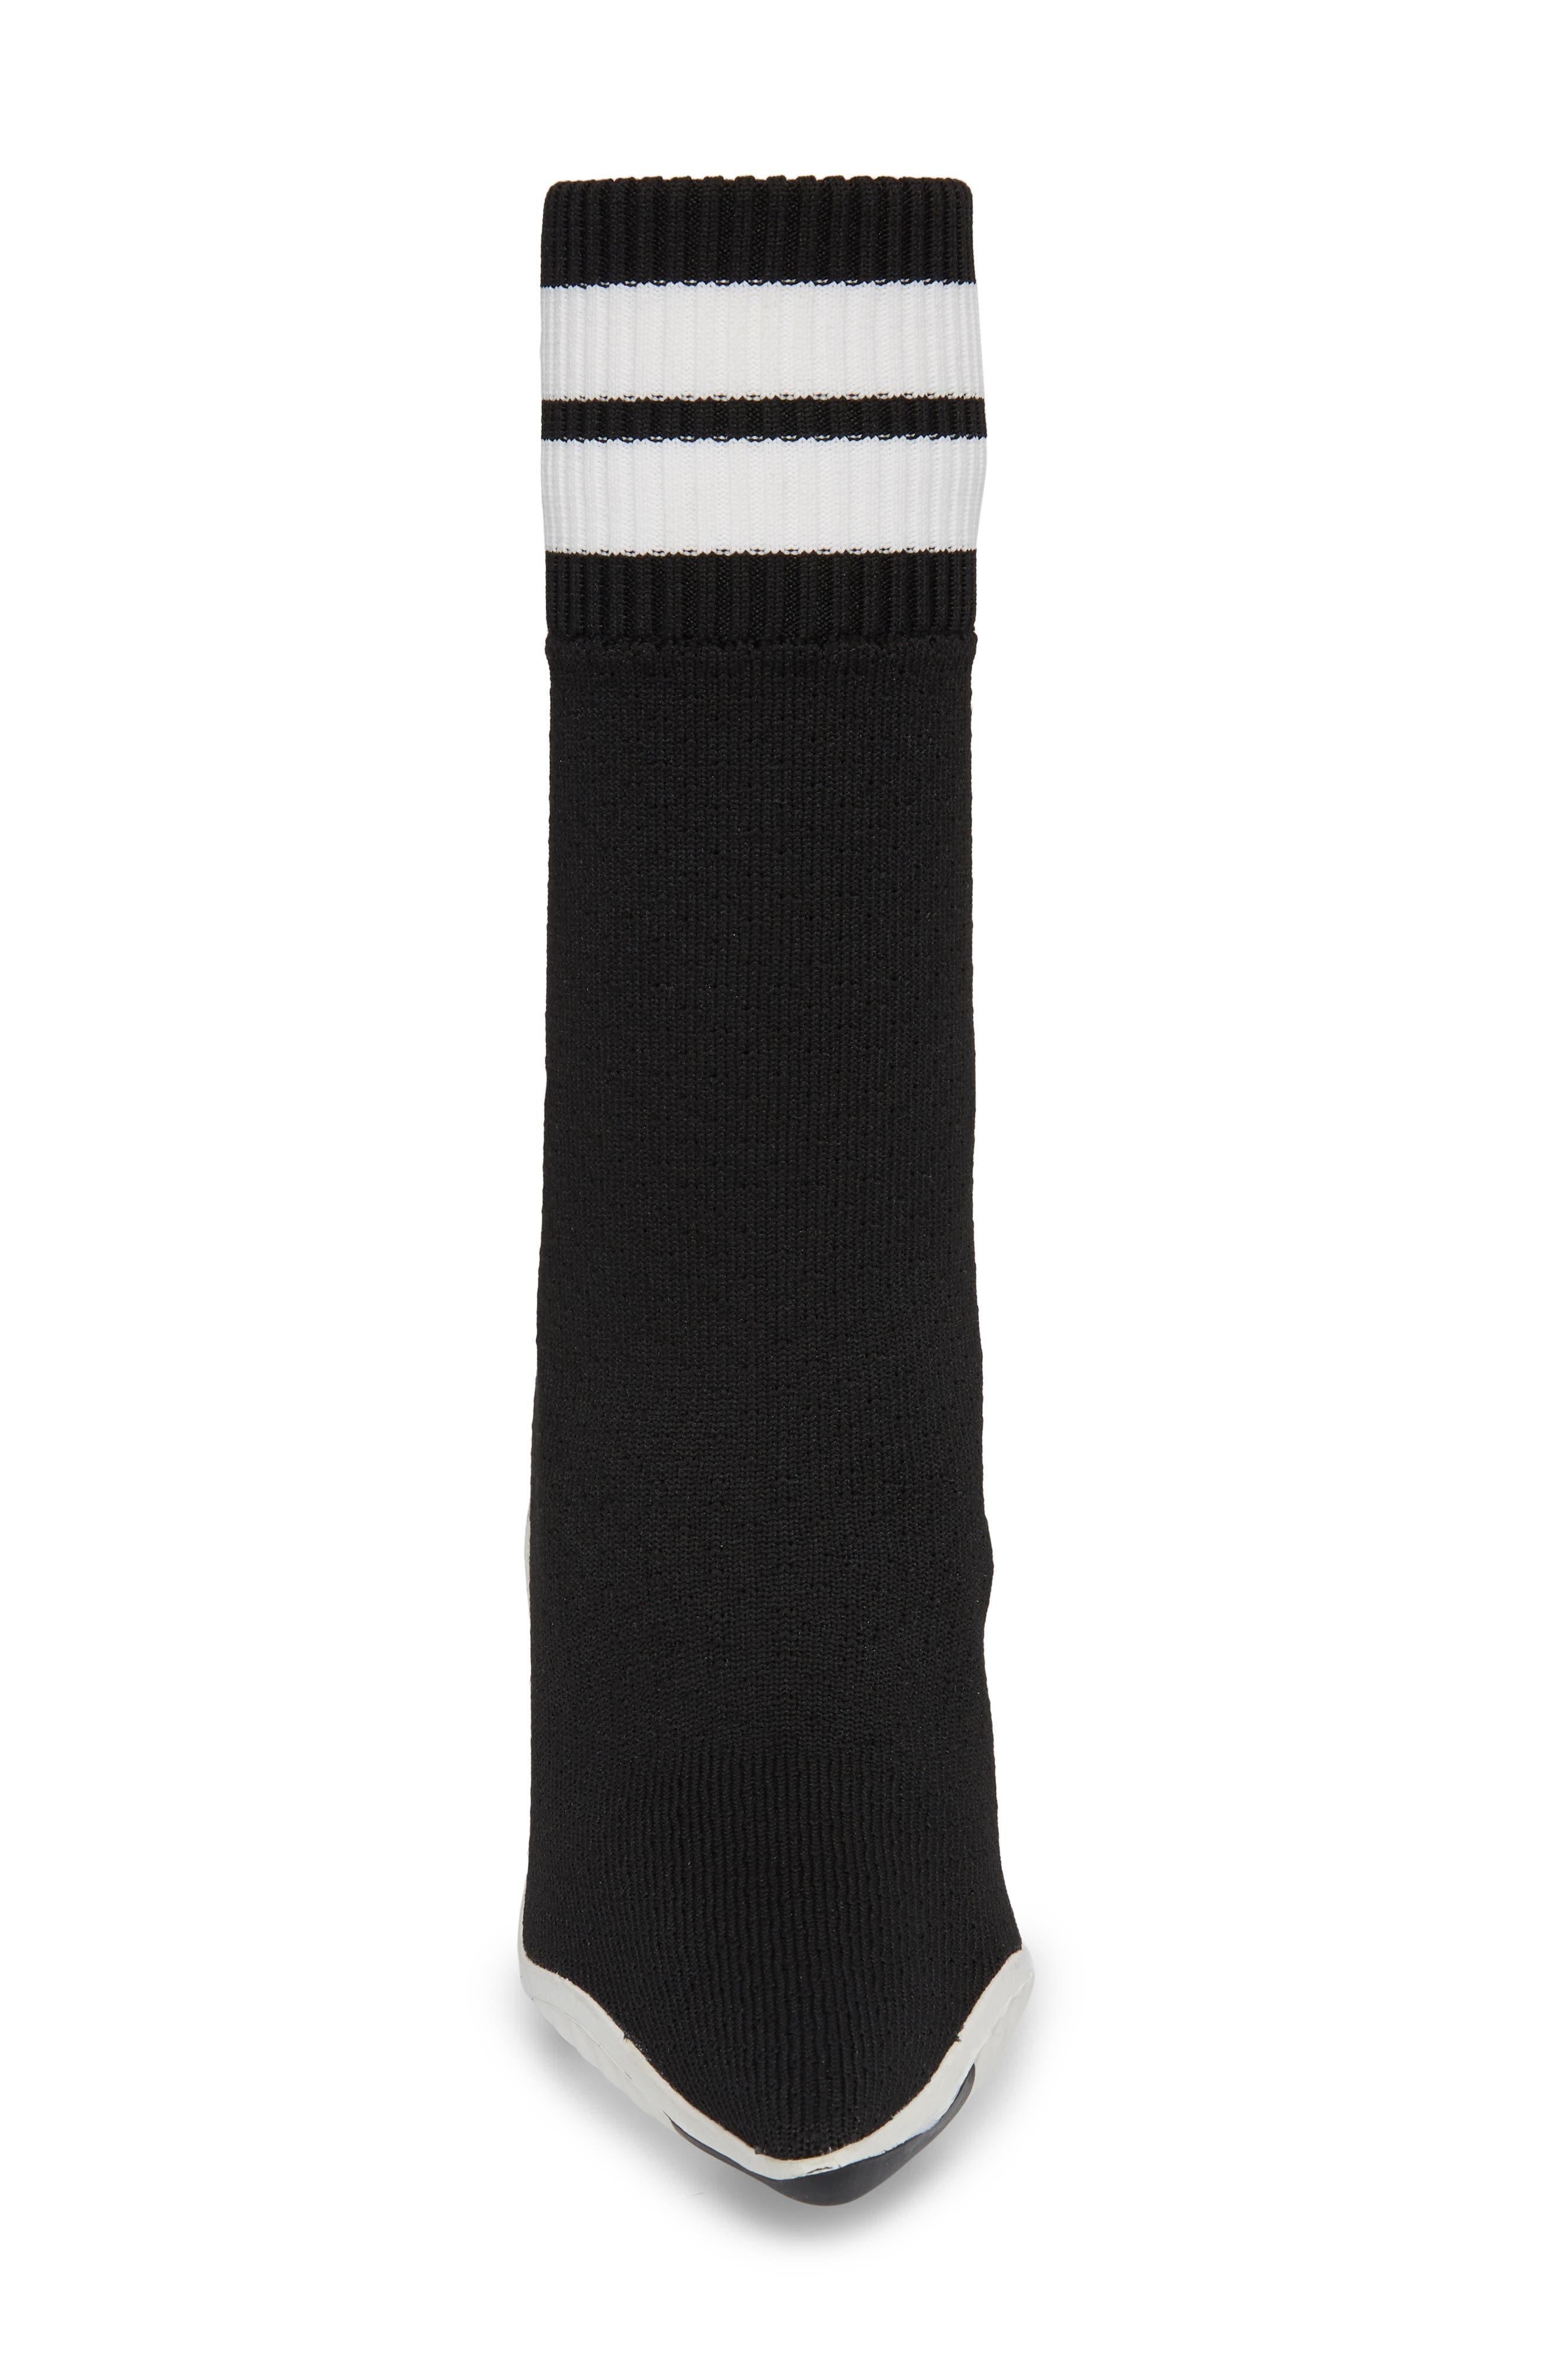 JEFFREY CAMPBELL, Goal Sock Sneaker Bootie, Alternate thumbnail 4, color, BLACK/ WHITE FABRIC